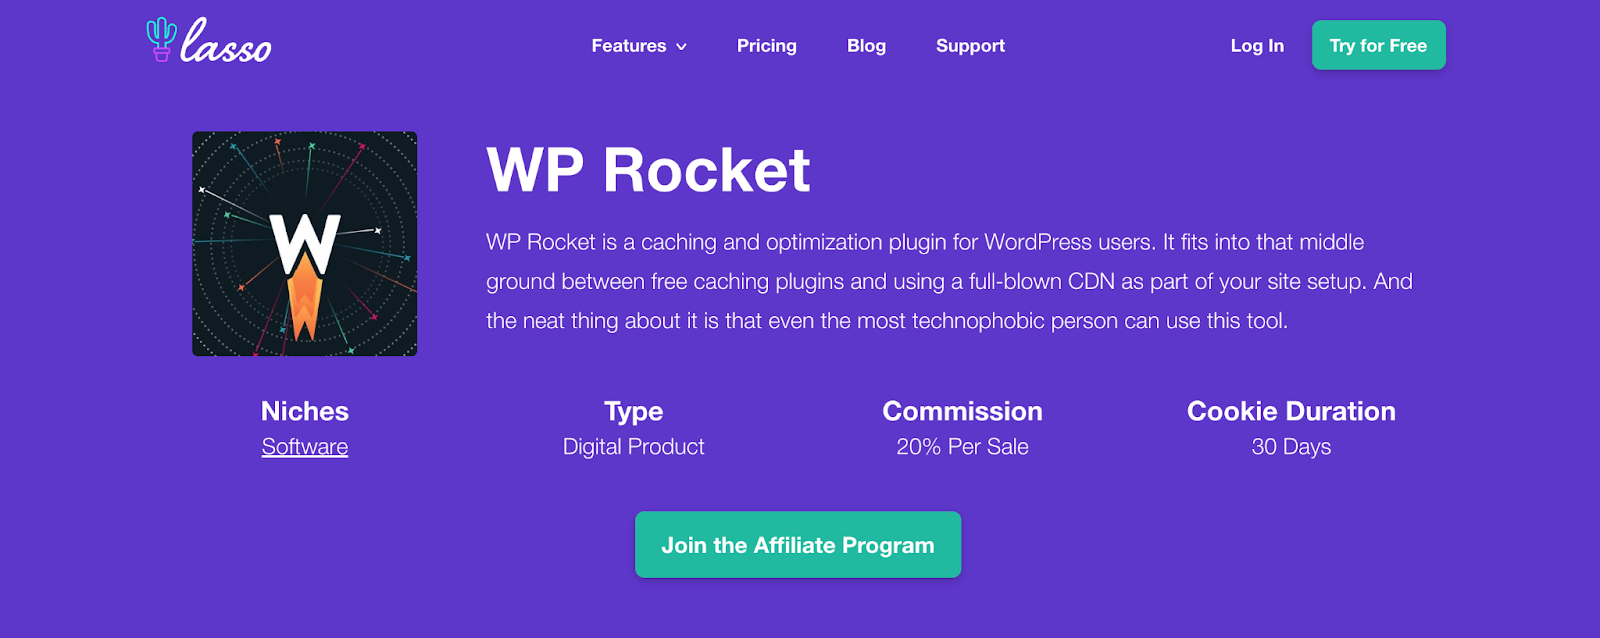 wp rocket affiliate program details page in lasso for your affiliate marketing website